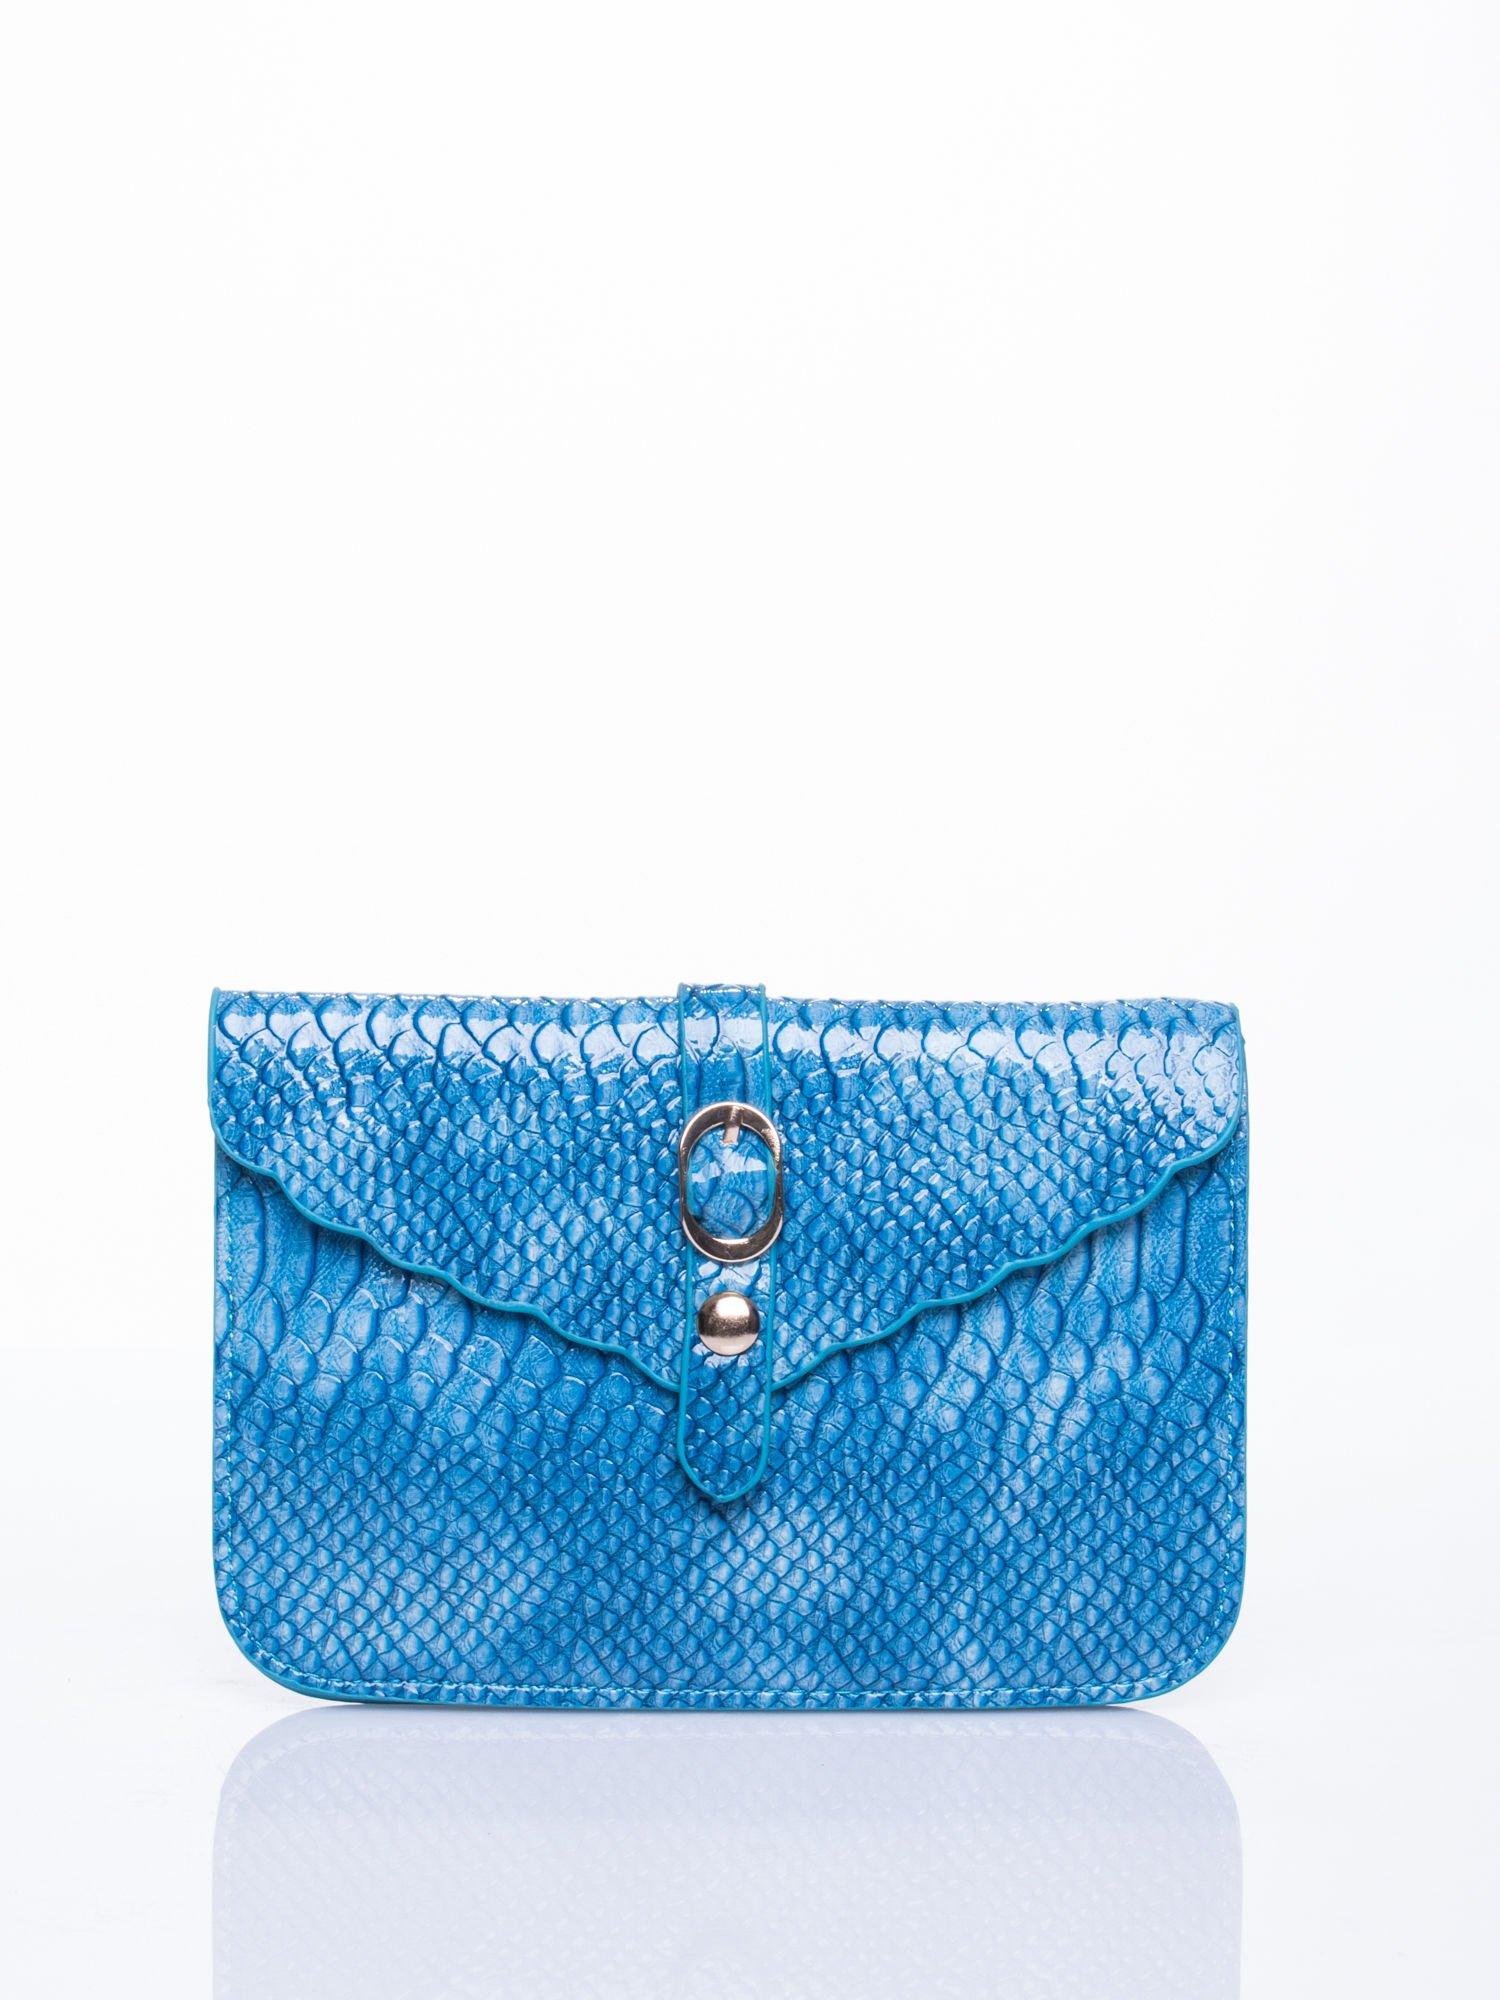 d3b18163e7806 Niebieska kopertówka z motywem skóry krokodyla - Akcesoria torba ...